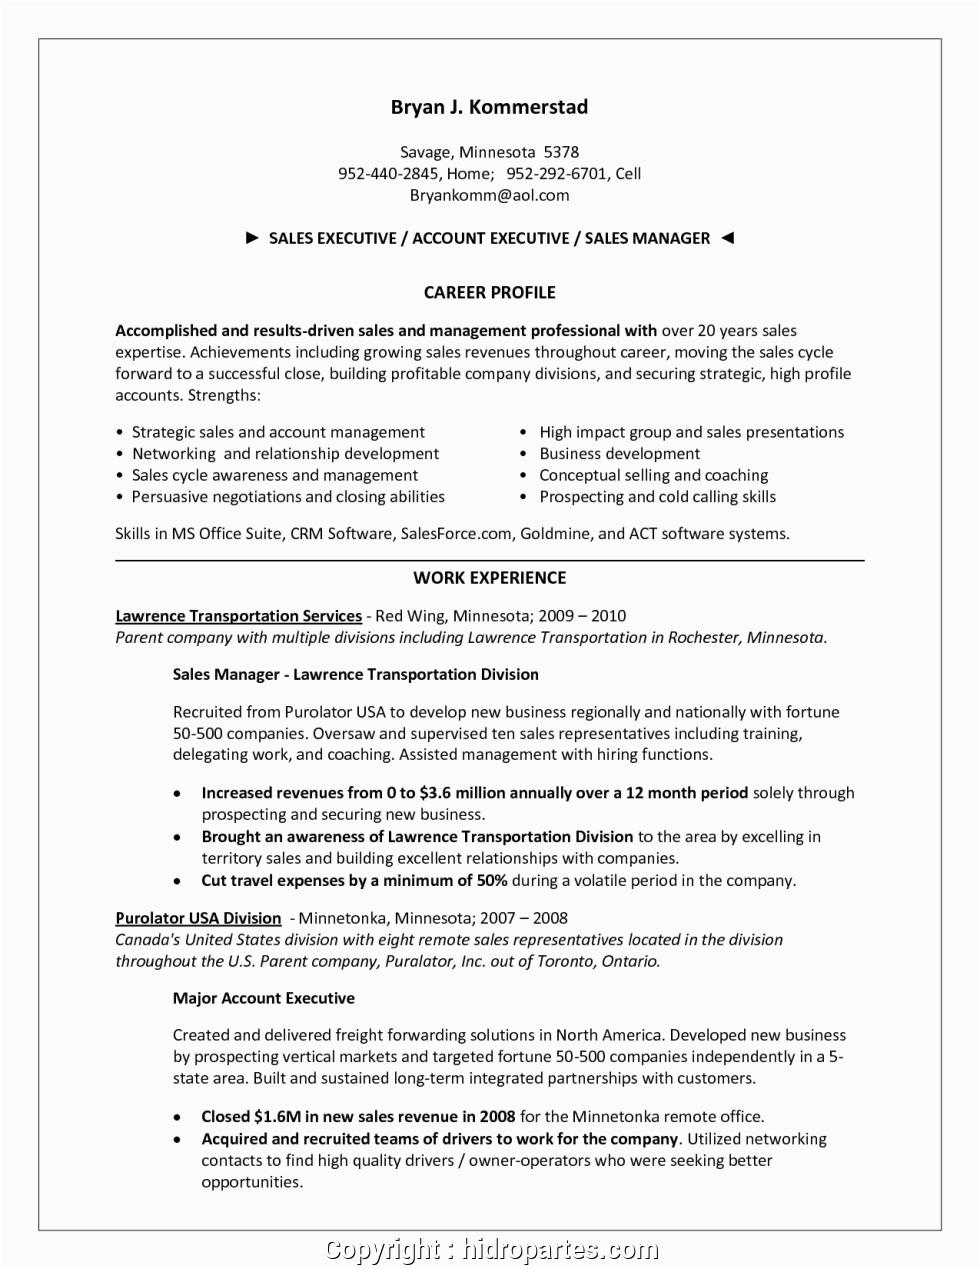 create sales resume ac plishments